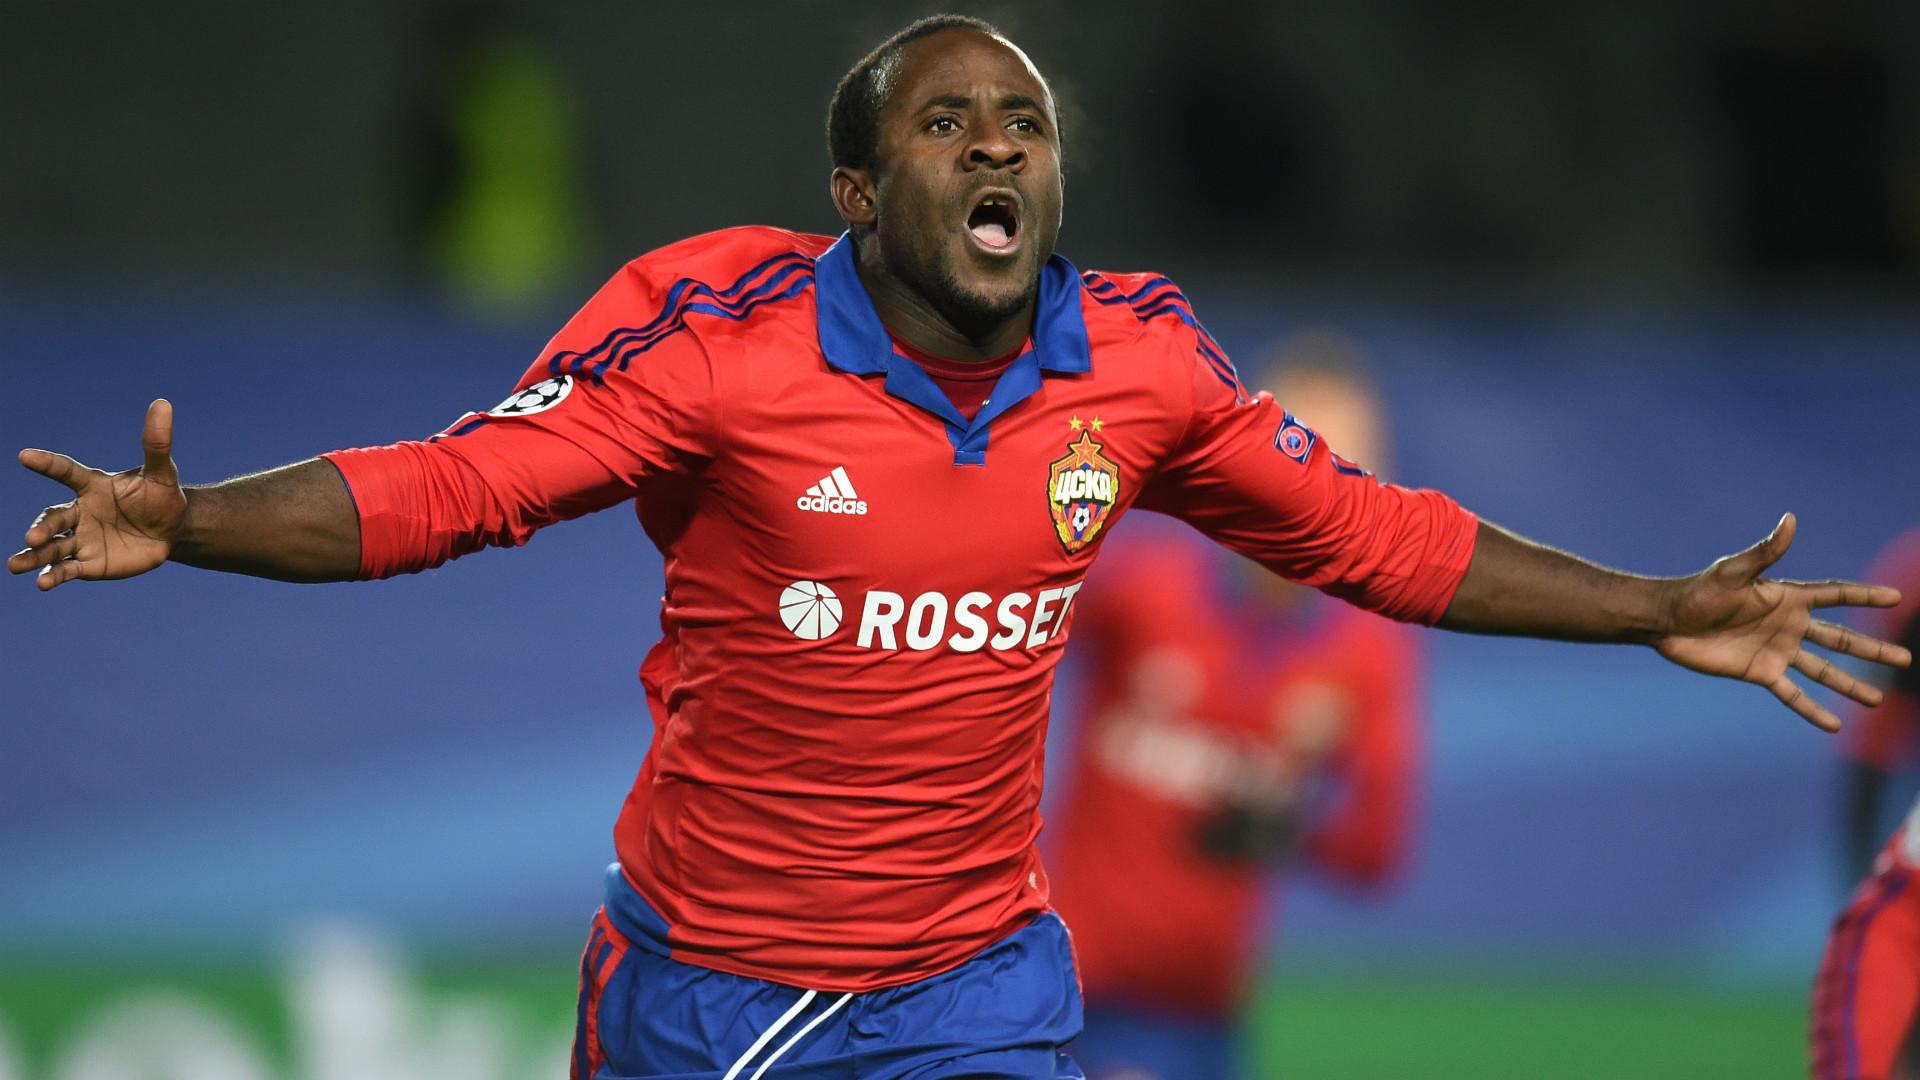 Seydou Doumbia CSKA Moscow Manchester United Champions League